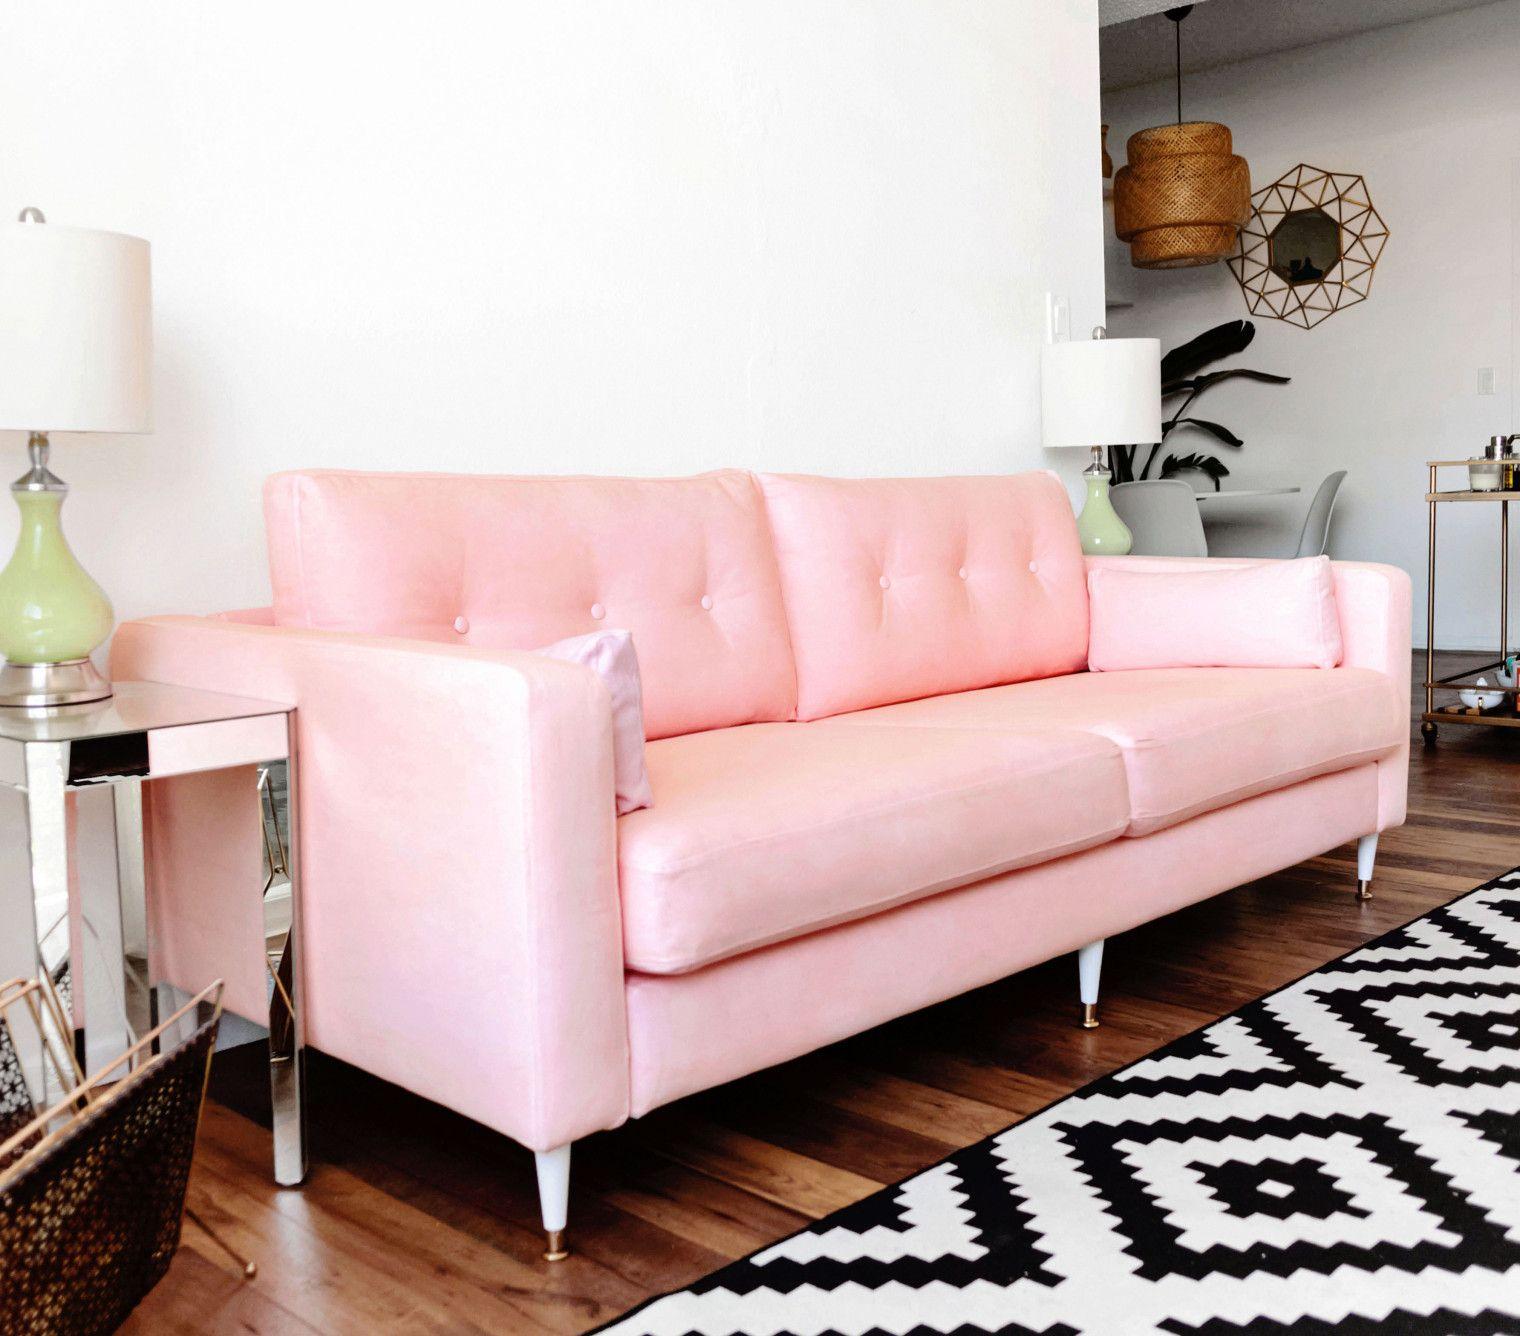 KARLSTAD SOFA IKEA HACK Mid Century Inspired Pink Sofa …